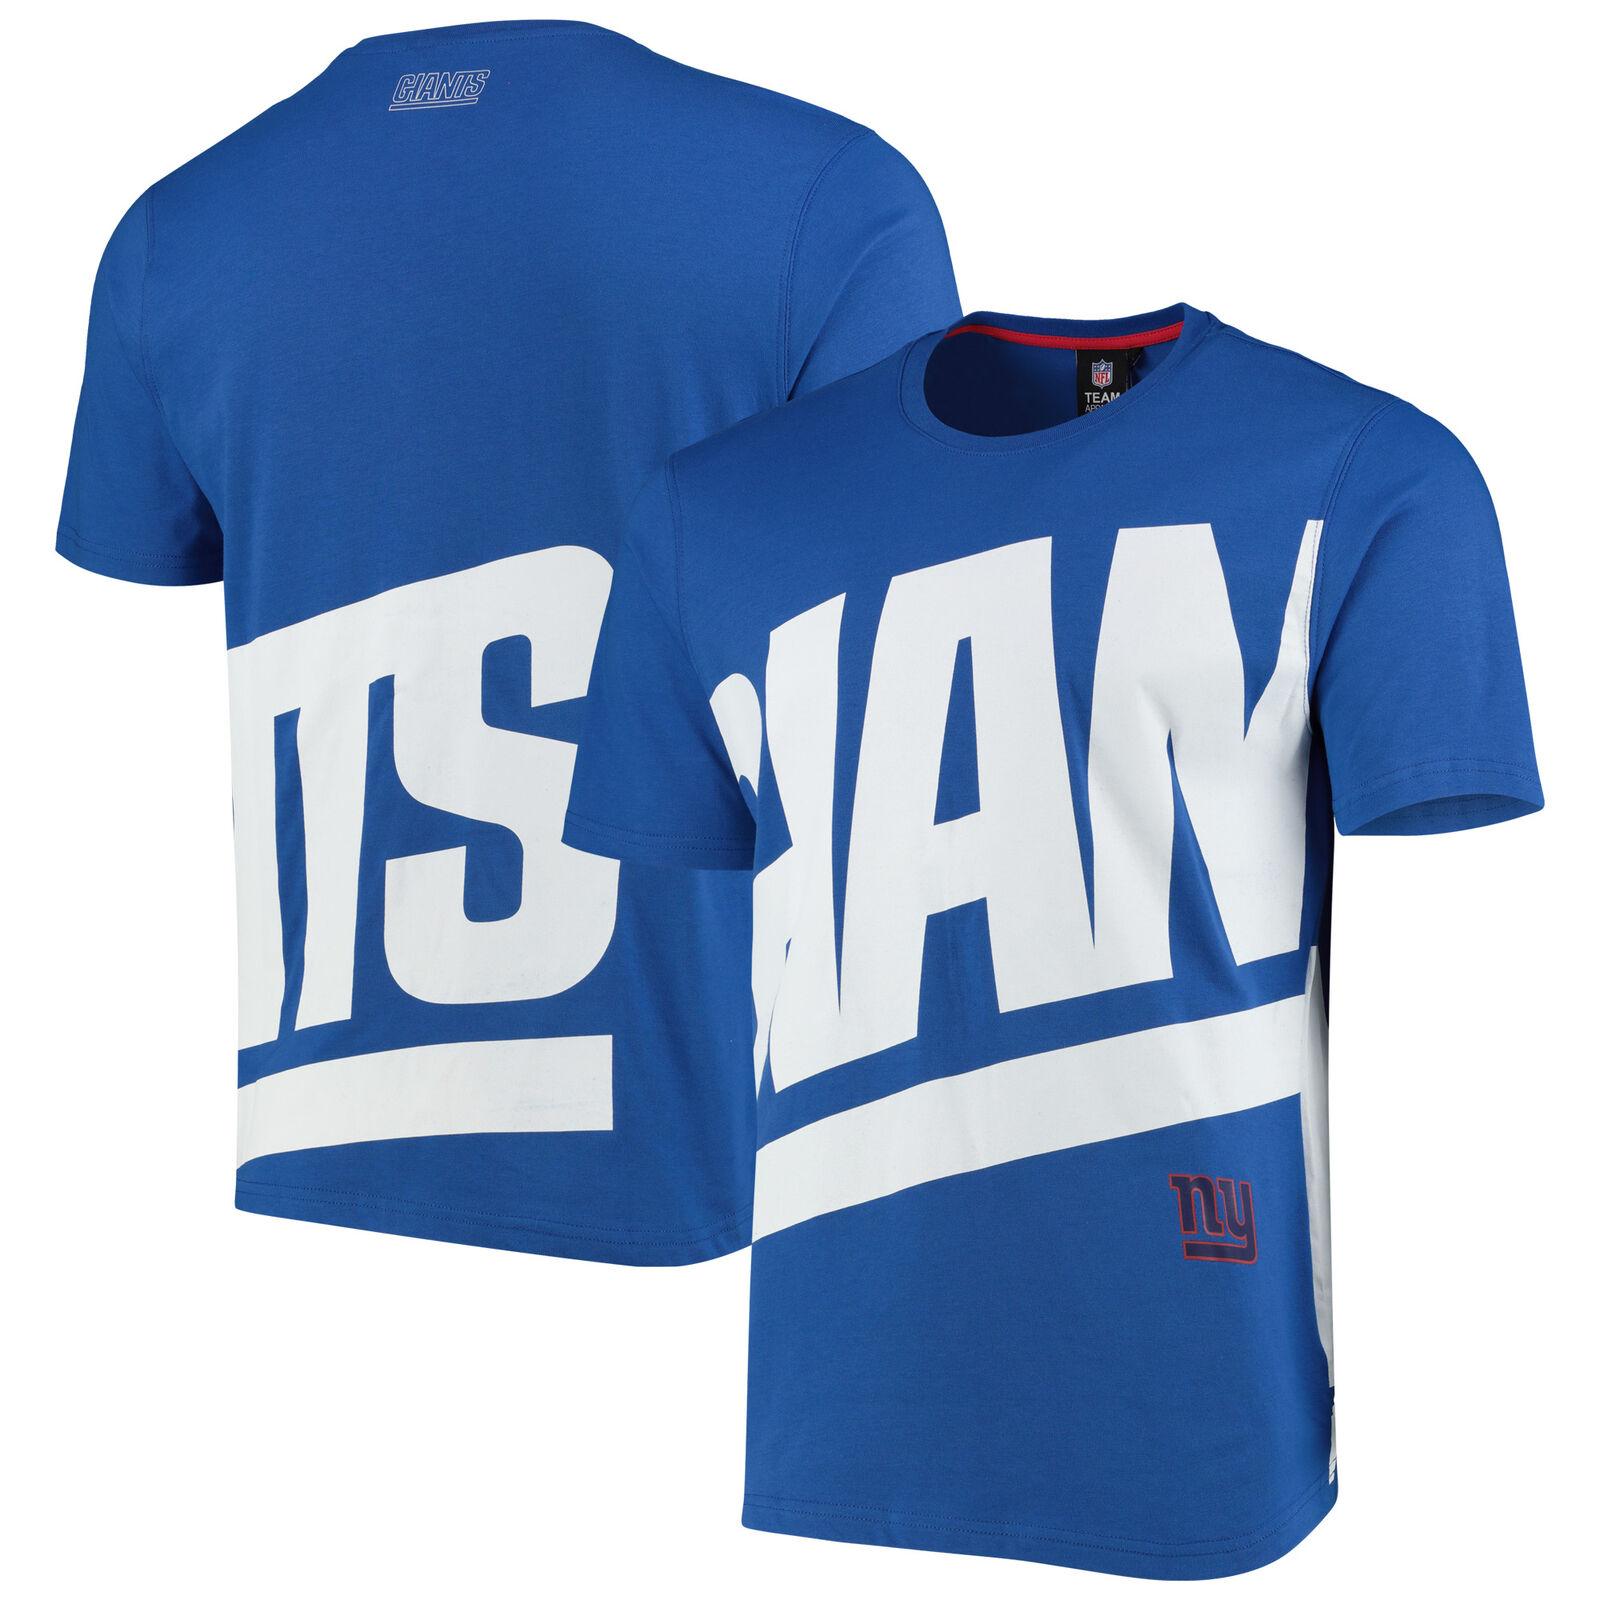 New York Giants Oversized Graphic Sleeve Top T-Shirt Shirt Tee Blue - Mens